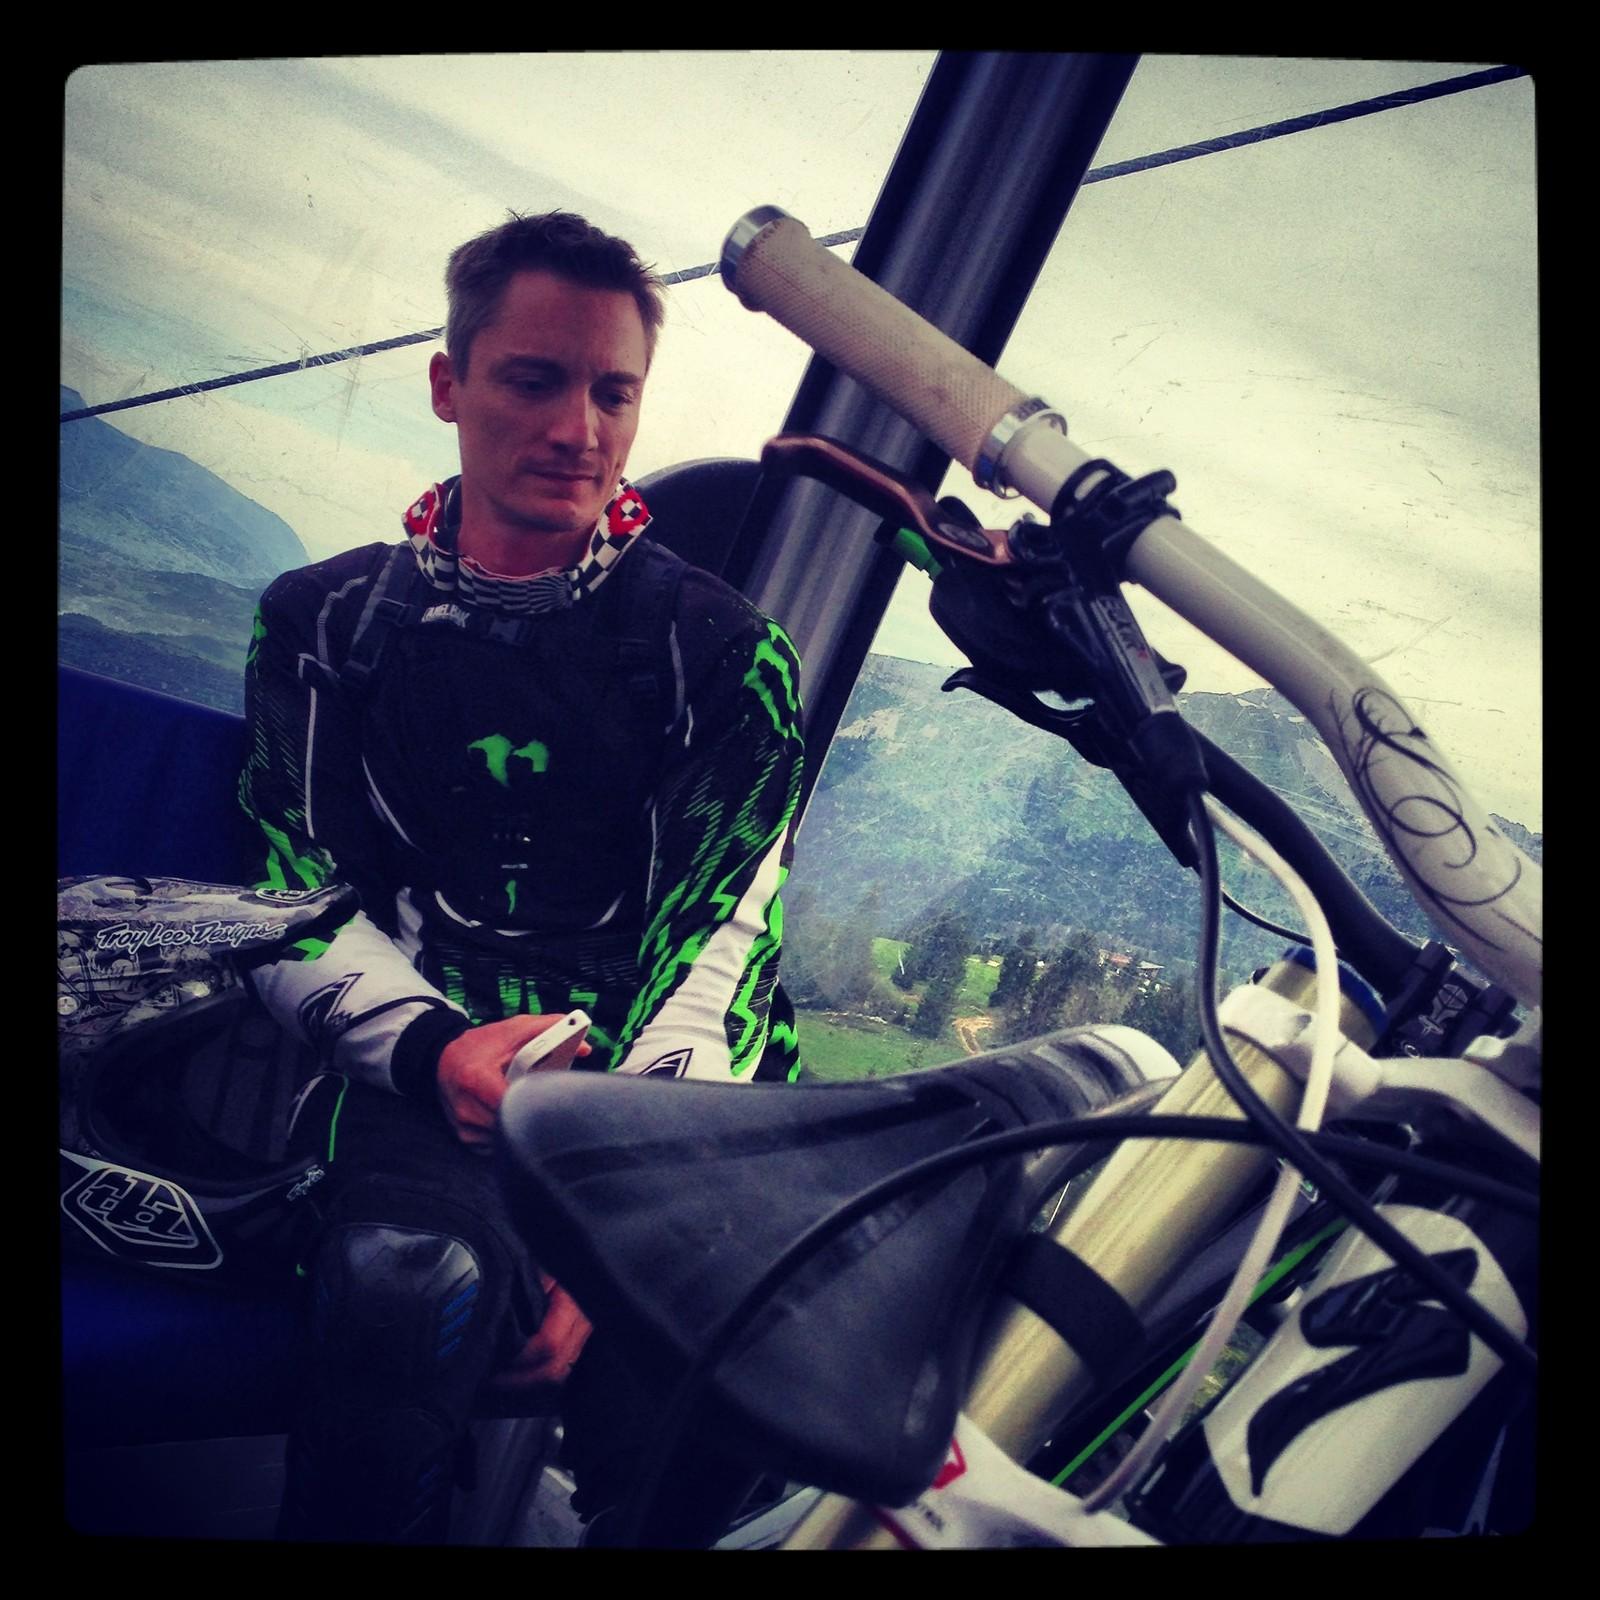 Waiting... - gilles.pfeiffer - Mountain Biking Pictures - Vital MTB